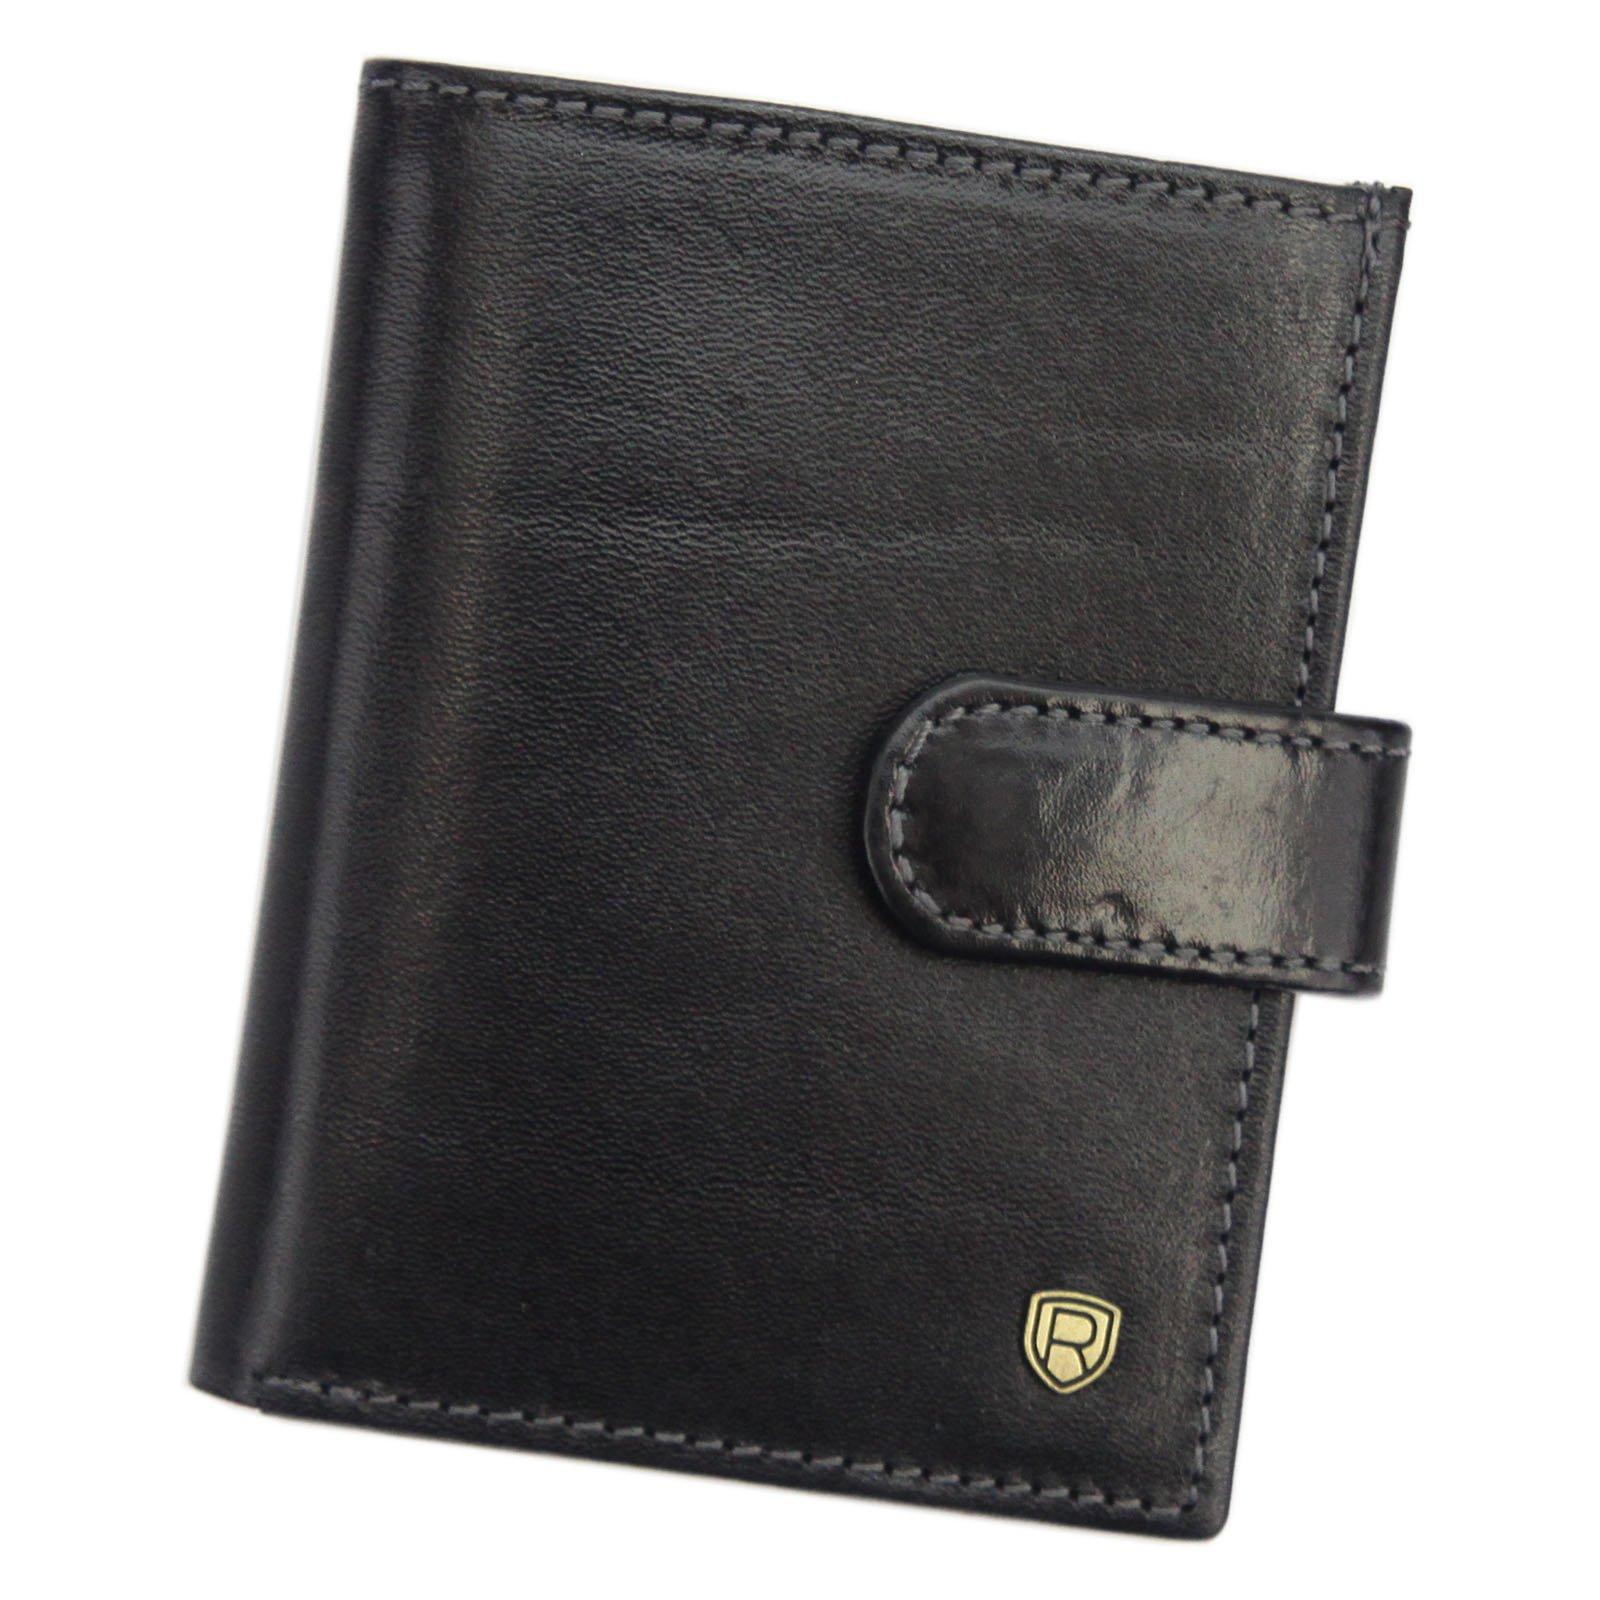 Puzdro na karty a doklady Rovicky TW-04-RVT